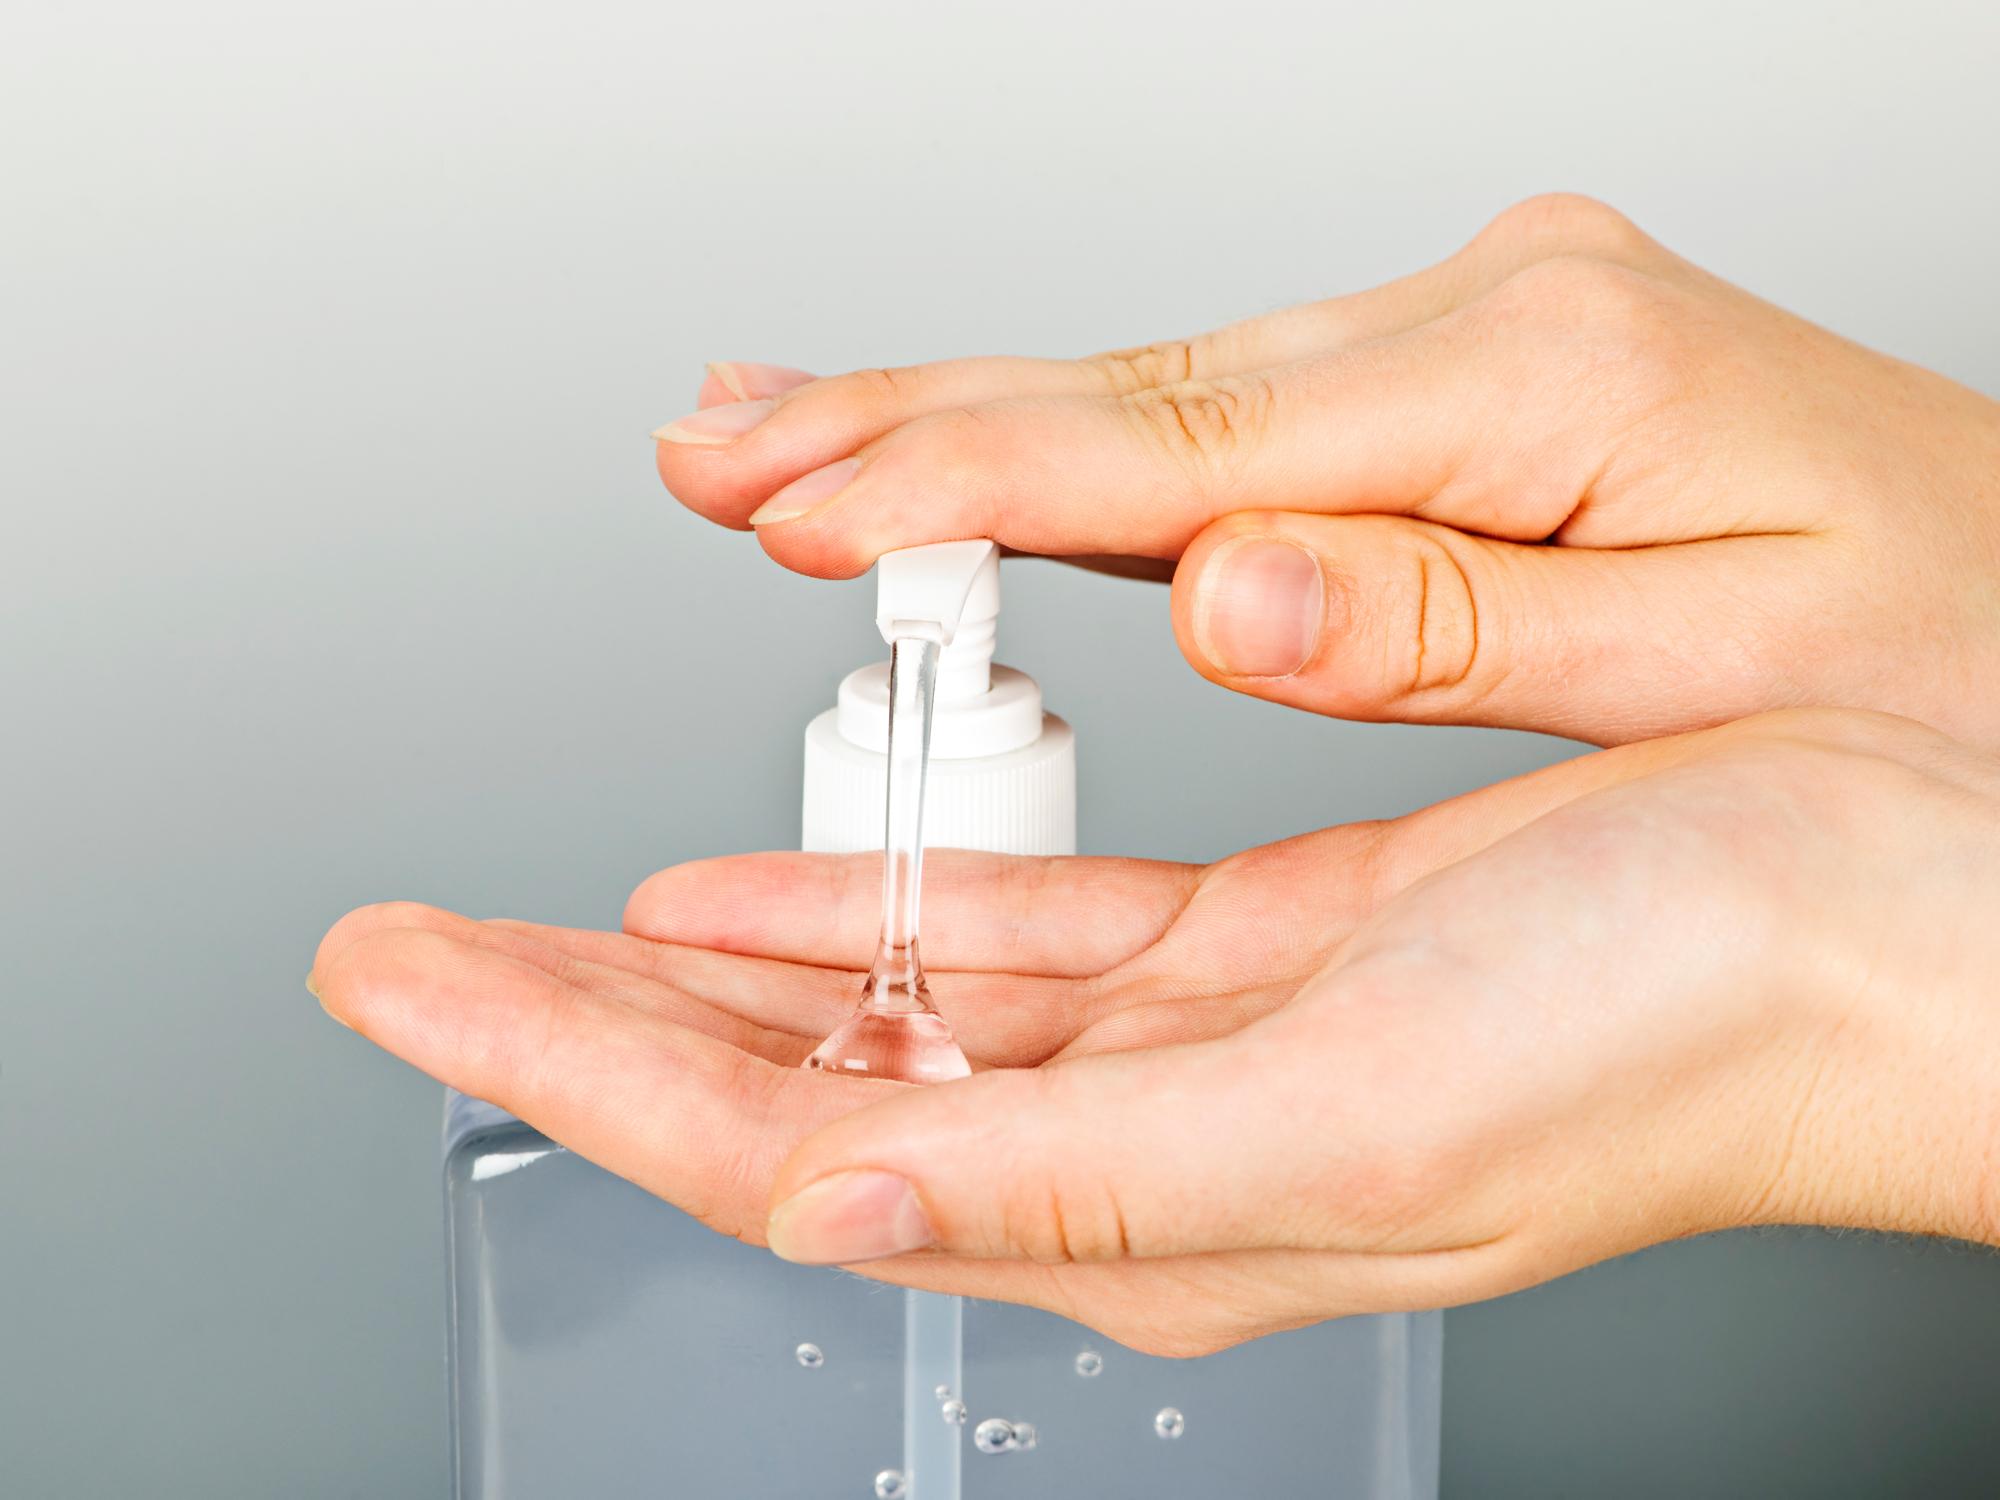 Hygienic Benefits of Using Hand Sanitiser